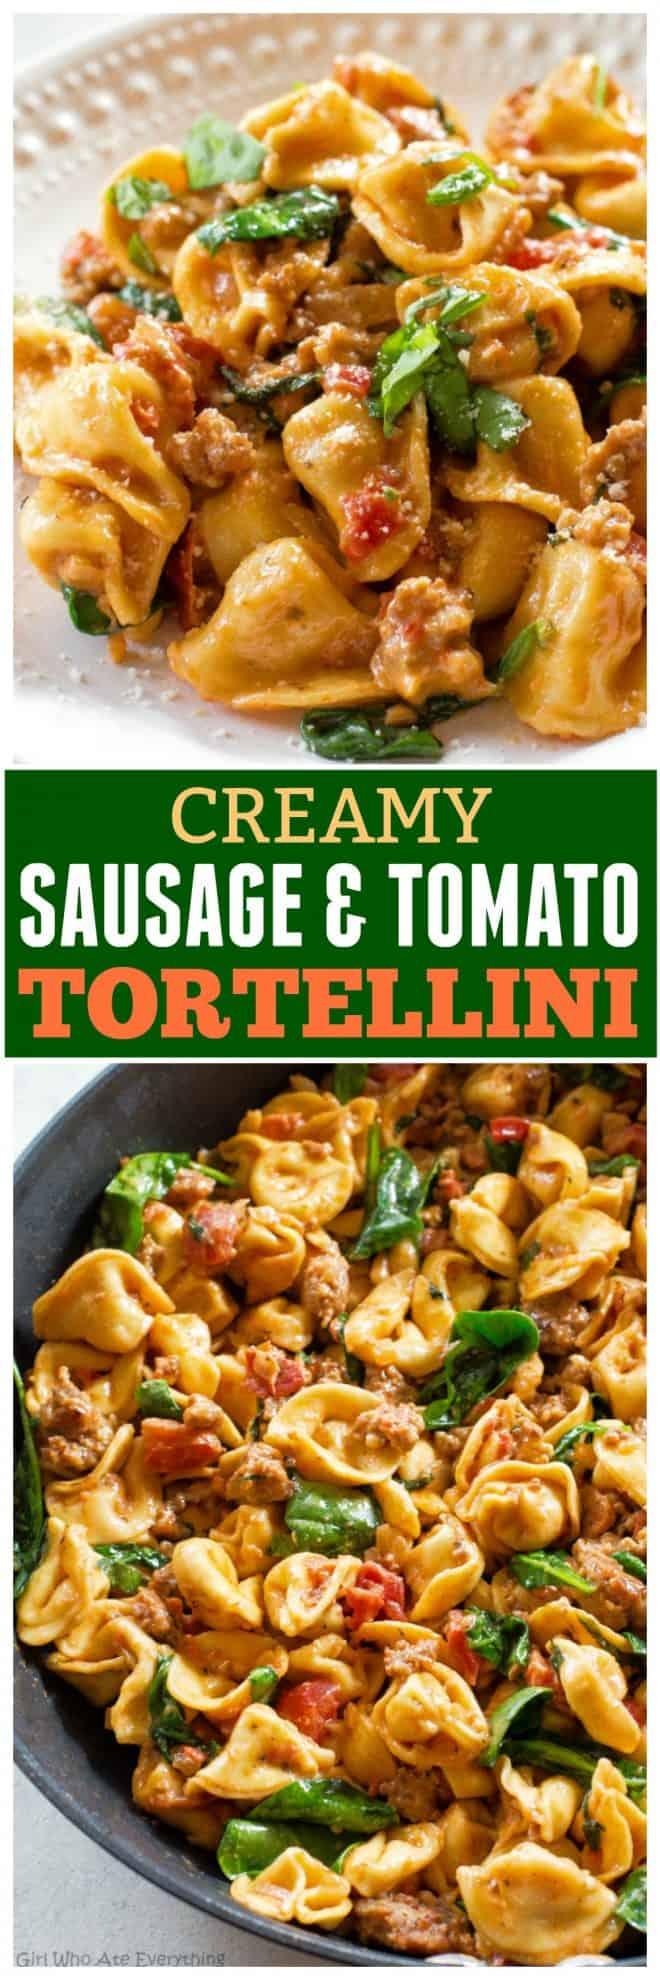 Creamy Sausage and Tomato Tortellini